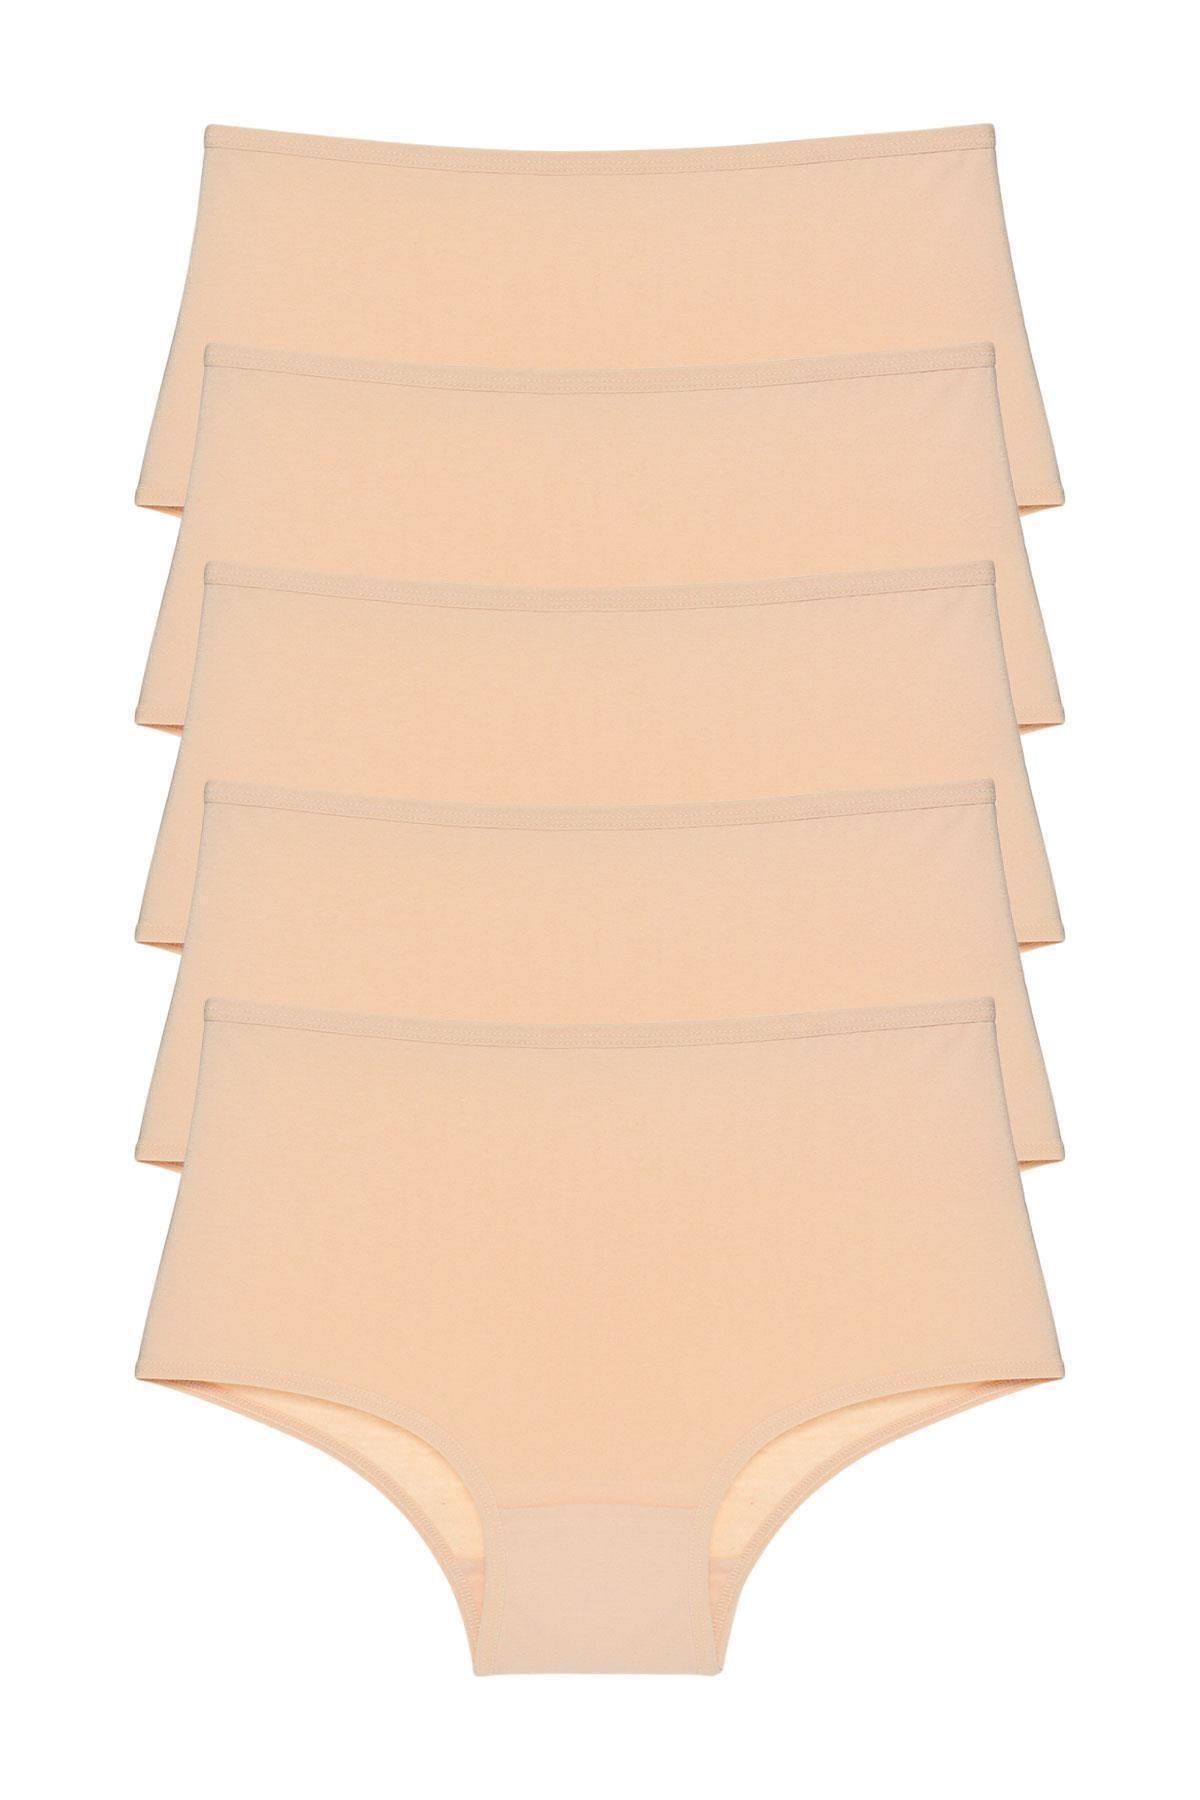 Kadın Ten Rengi Yüksek Bel Külot 5'li Paket